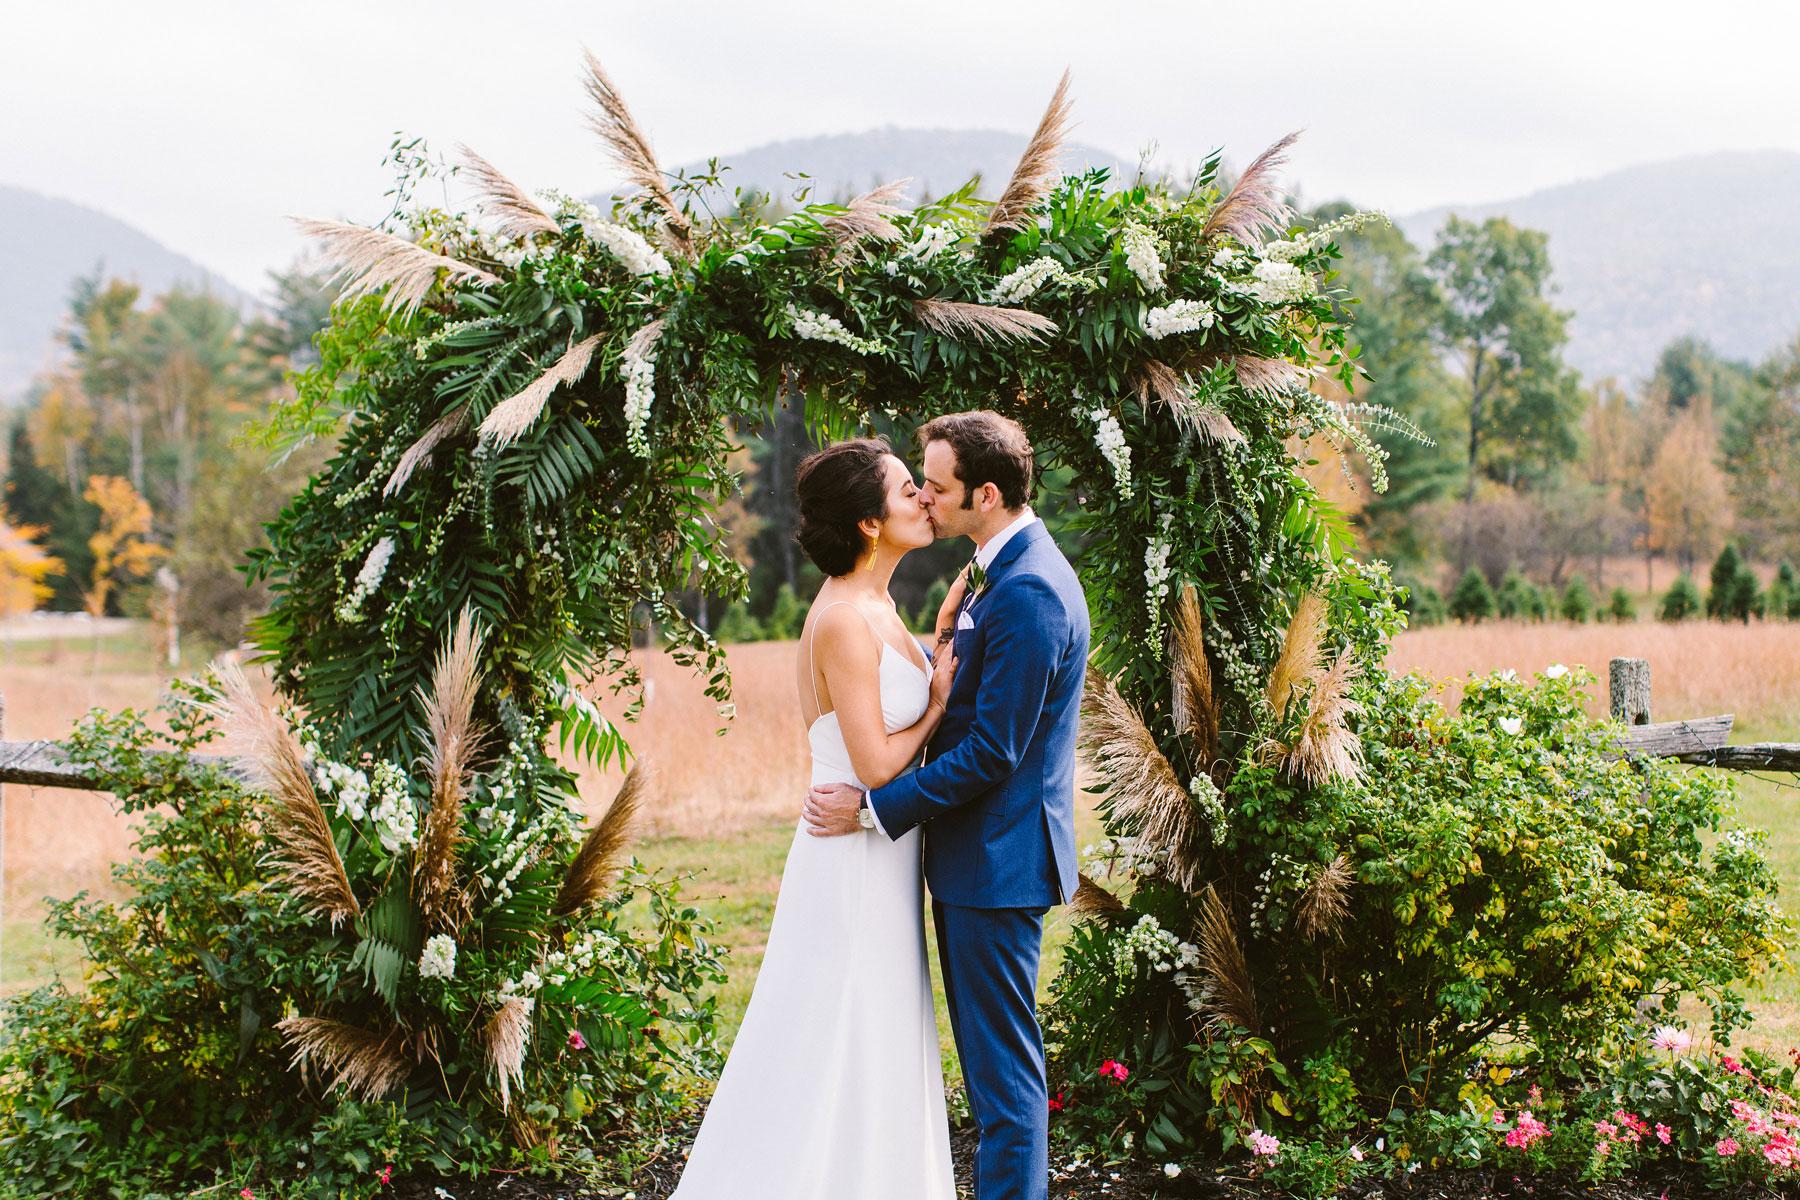 upstate new york outdoor wedding venues